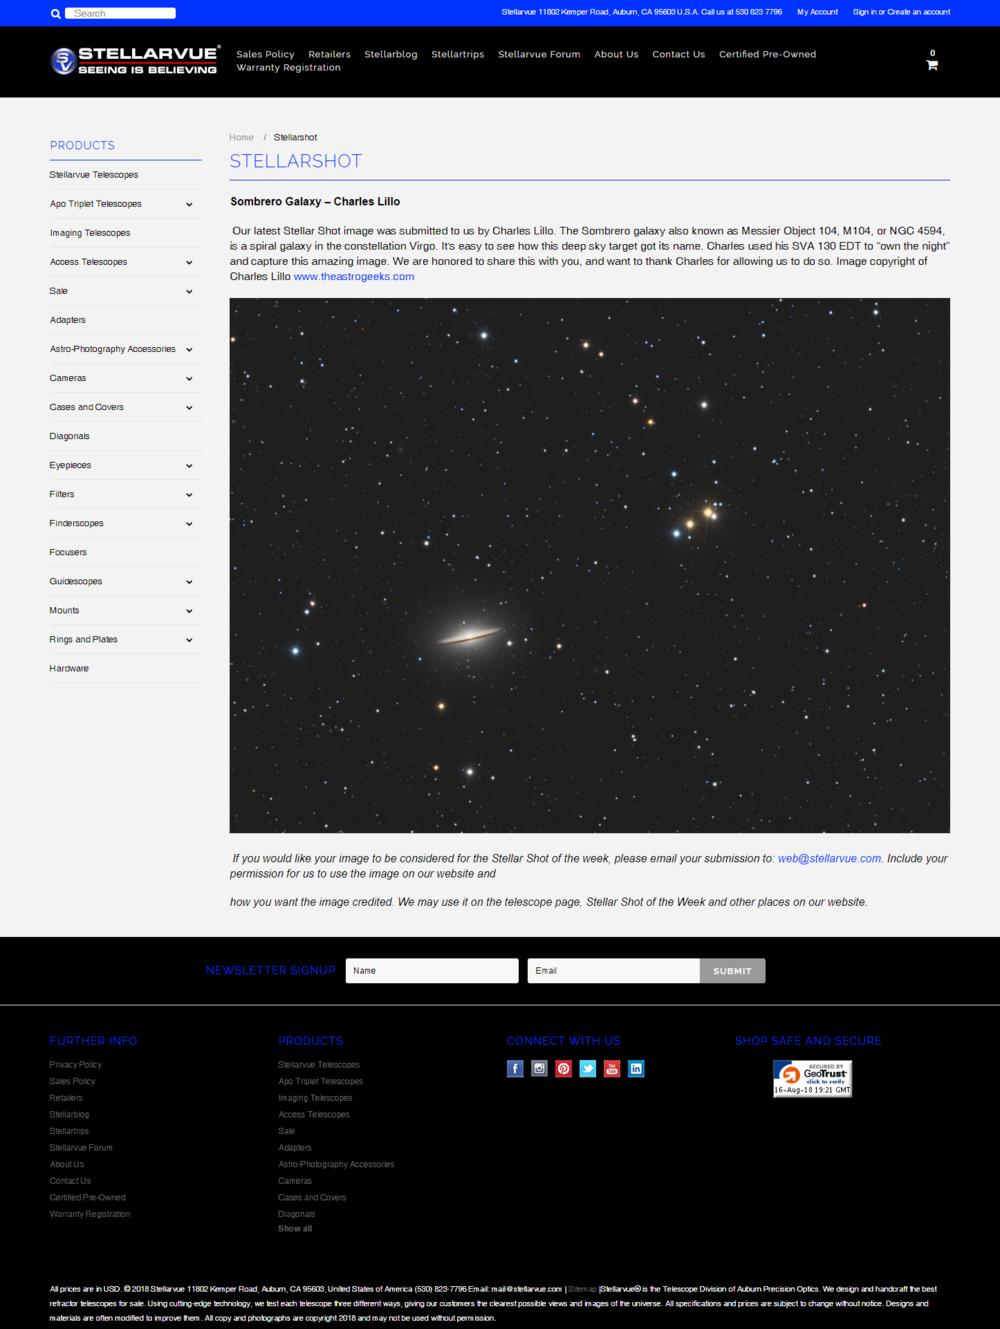 2018-08-16-15-27-www.stellarvue.com.png